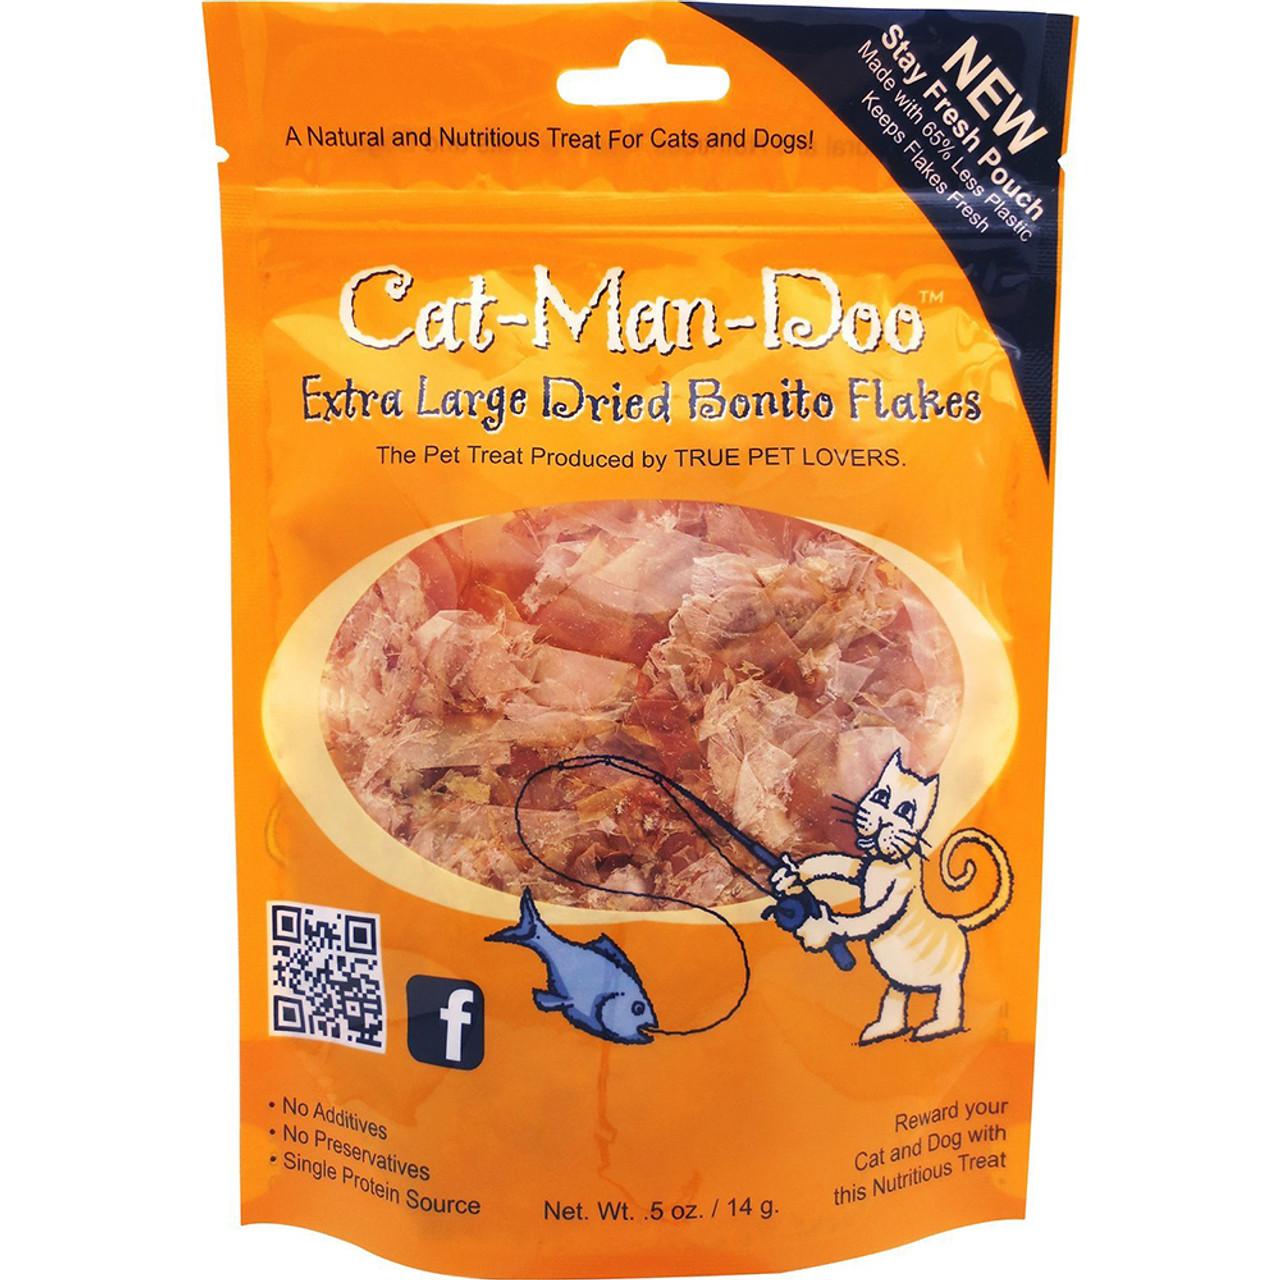 Cat-Man-Doo Bonito Fish Flake Cat Treats